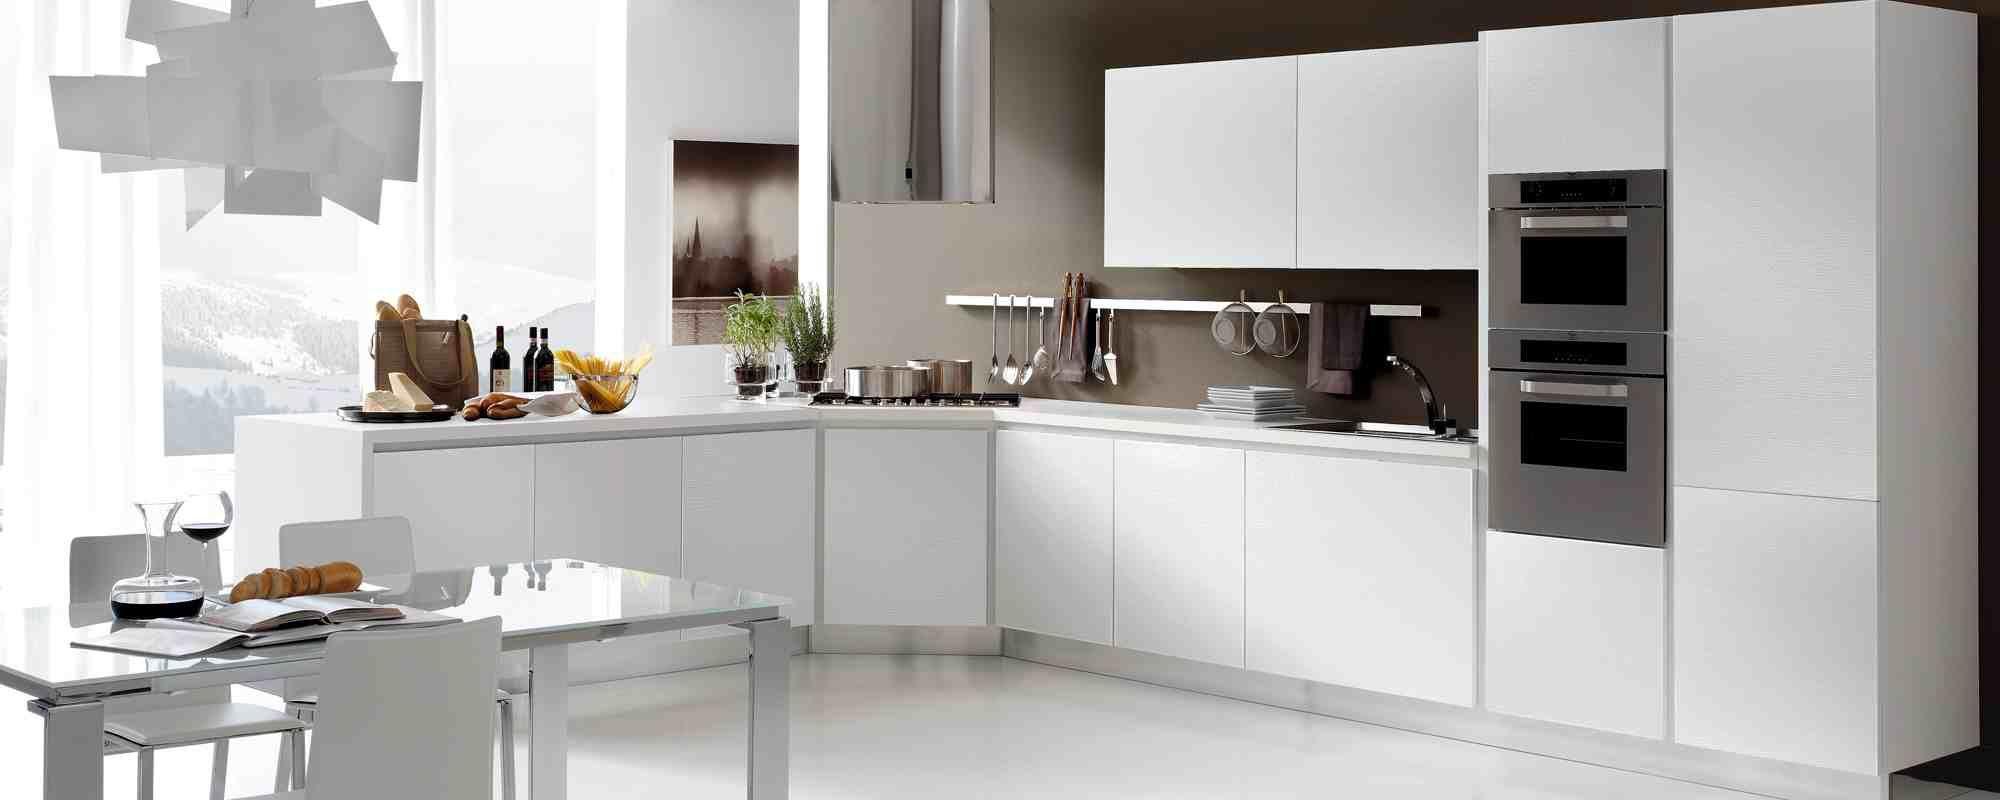 cucine moderne stosa - modello cucina life 03   Kitchens   Pinterest ...